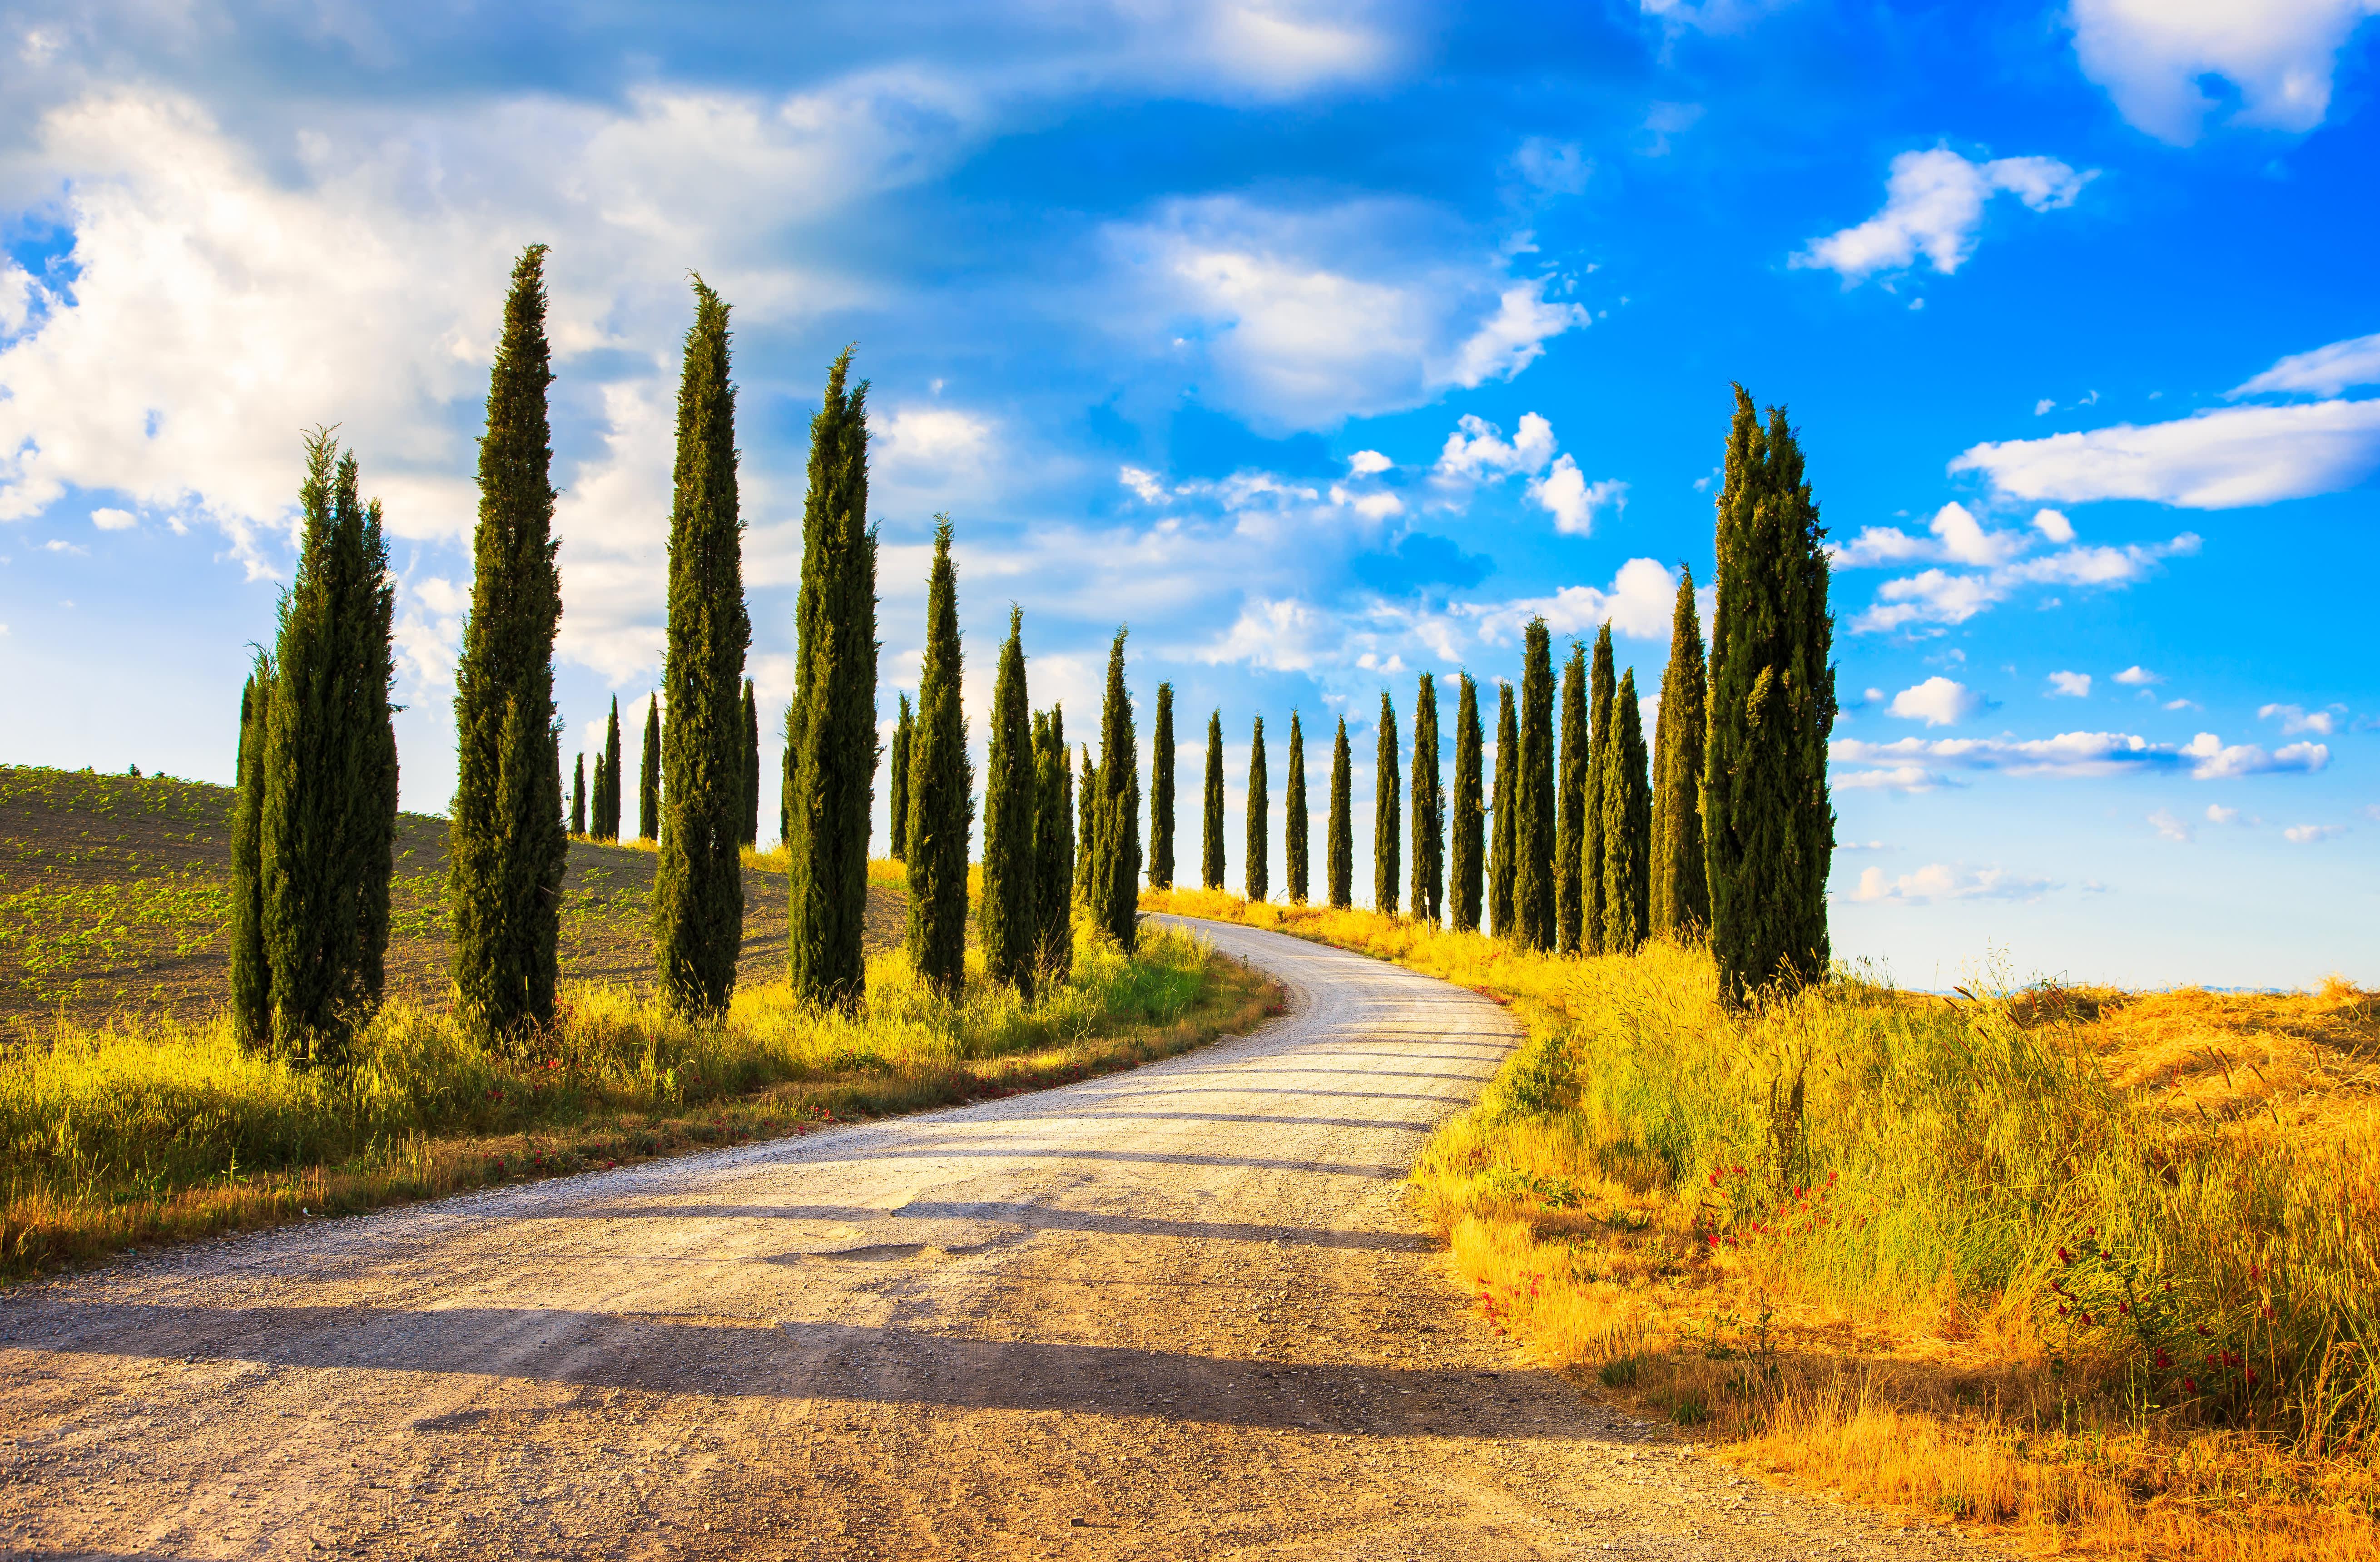 Italy travel guide - Tuscany